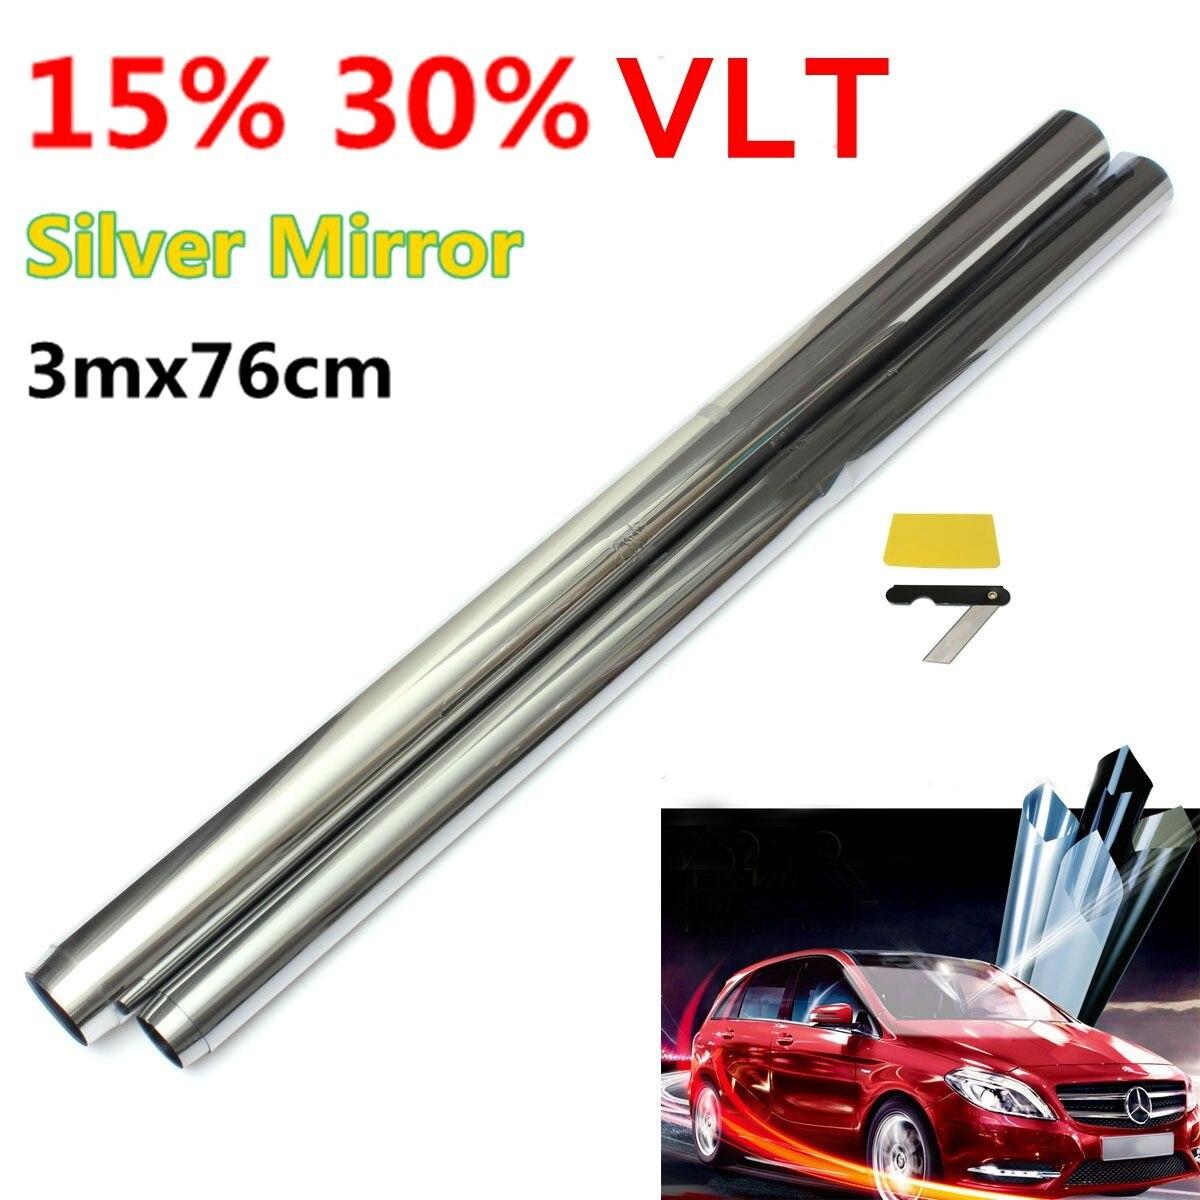 6M x 50cm Car Auto Van Chrome Silver Window Tint Film One Way Mirror Tinting Foil